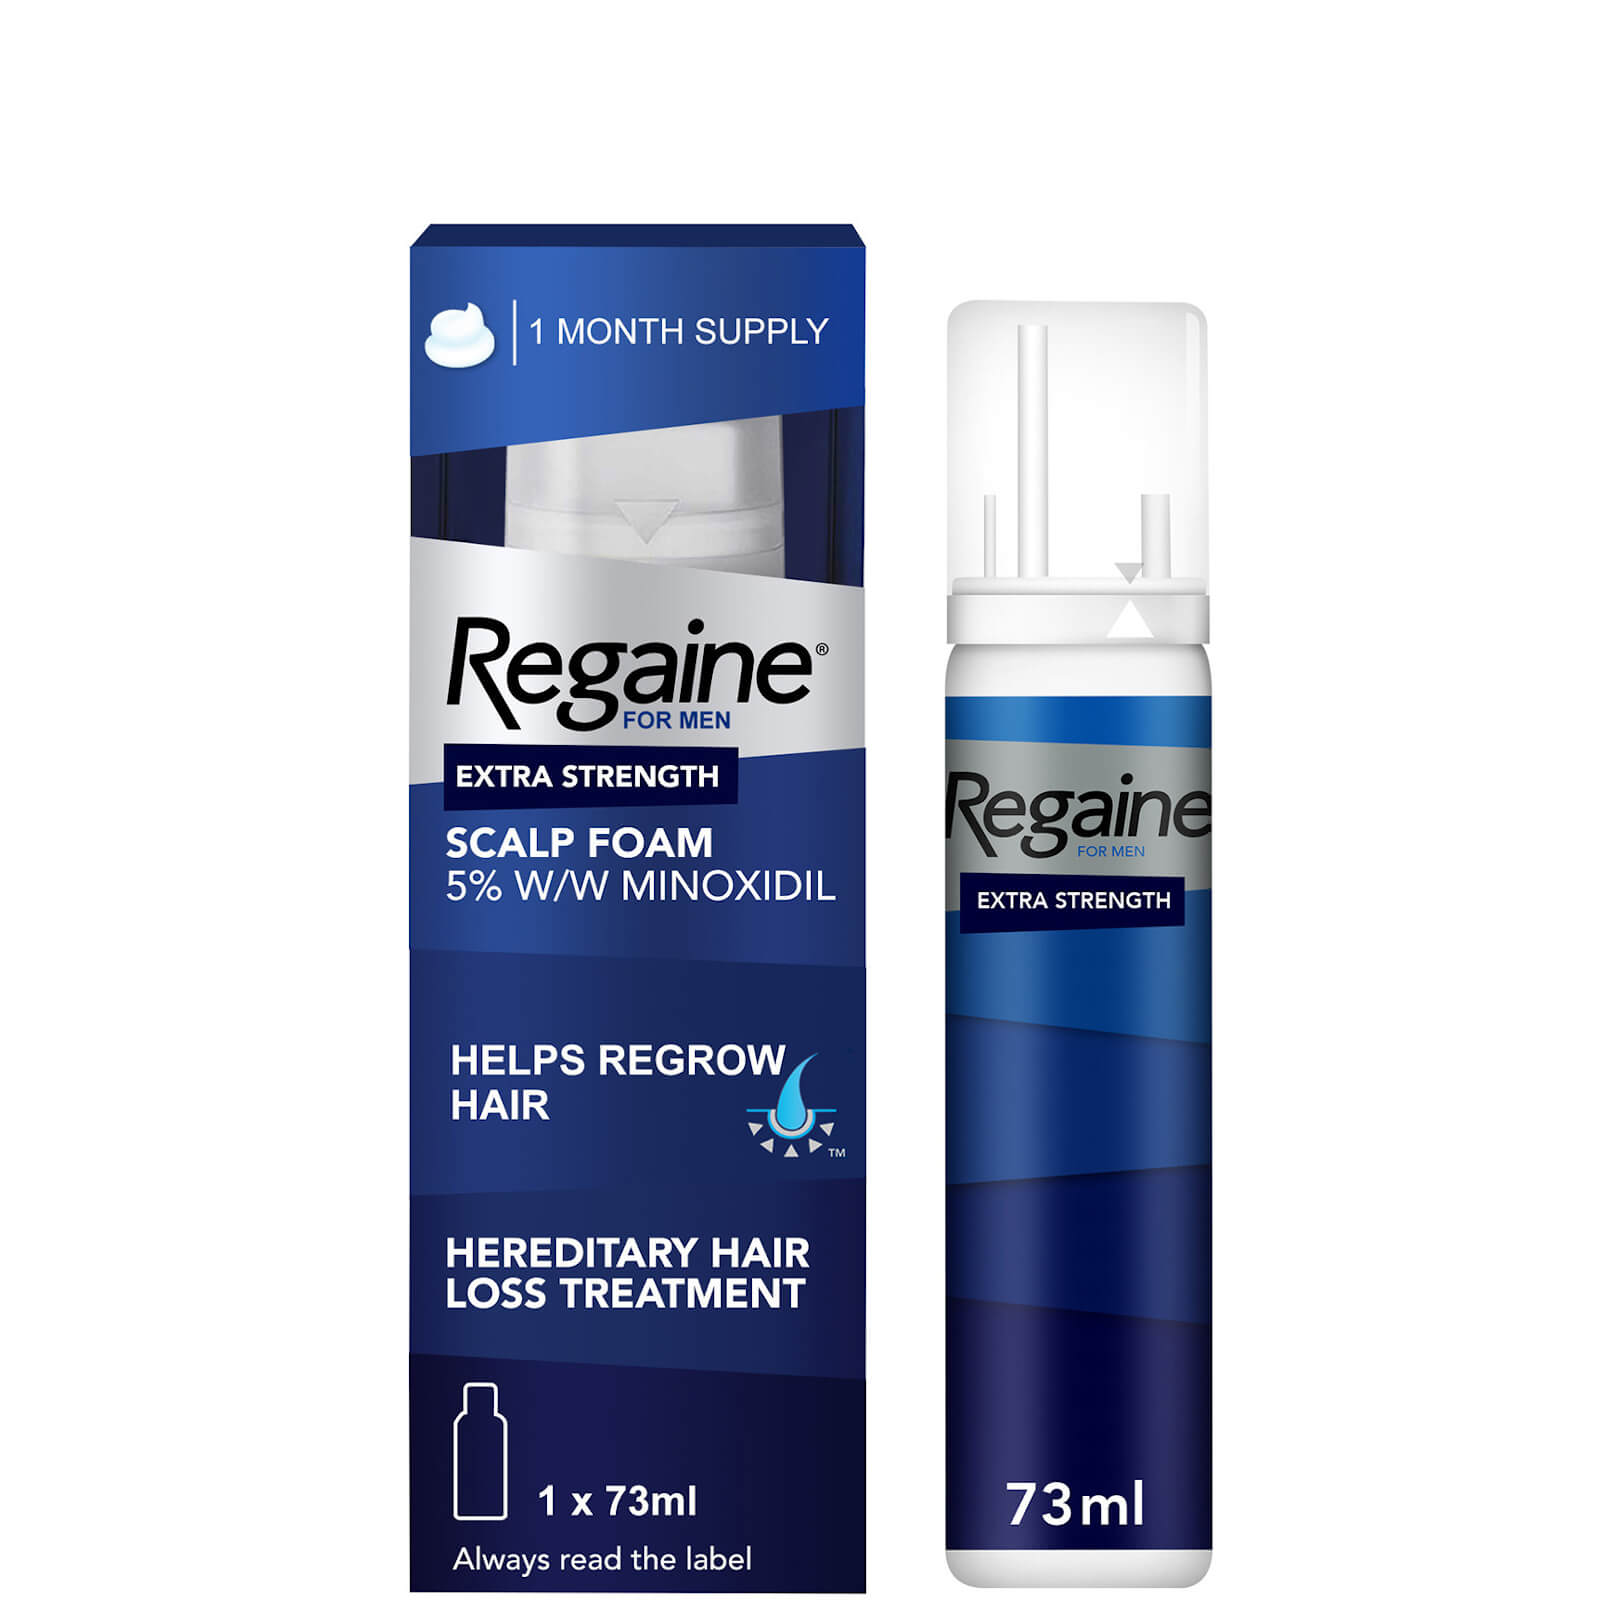 Regaine Men's Extra Strength Hair Loss and Hair Regrowth Scalp Foam Treatment 73ml